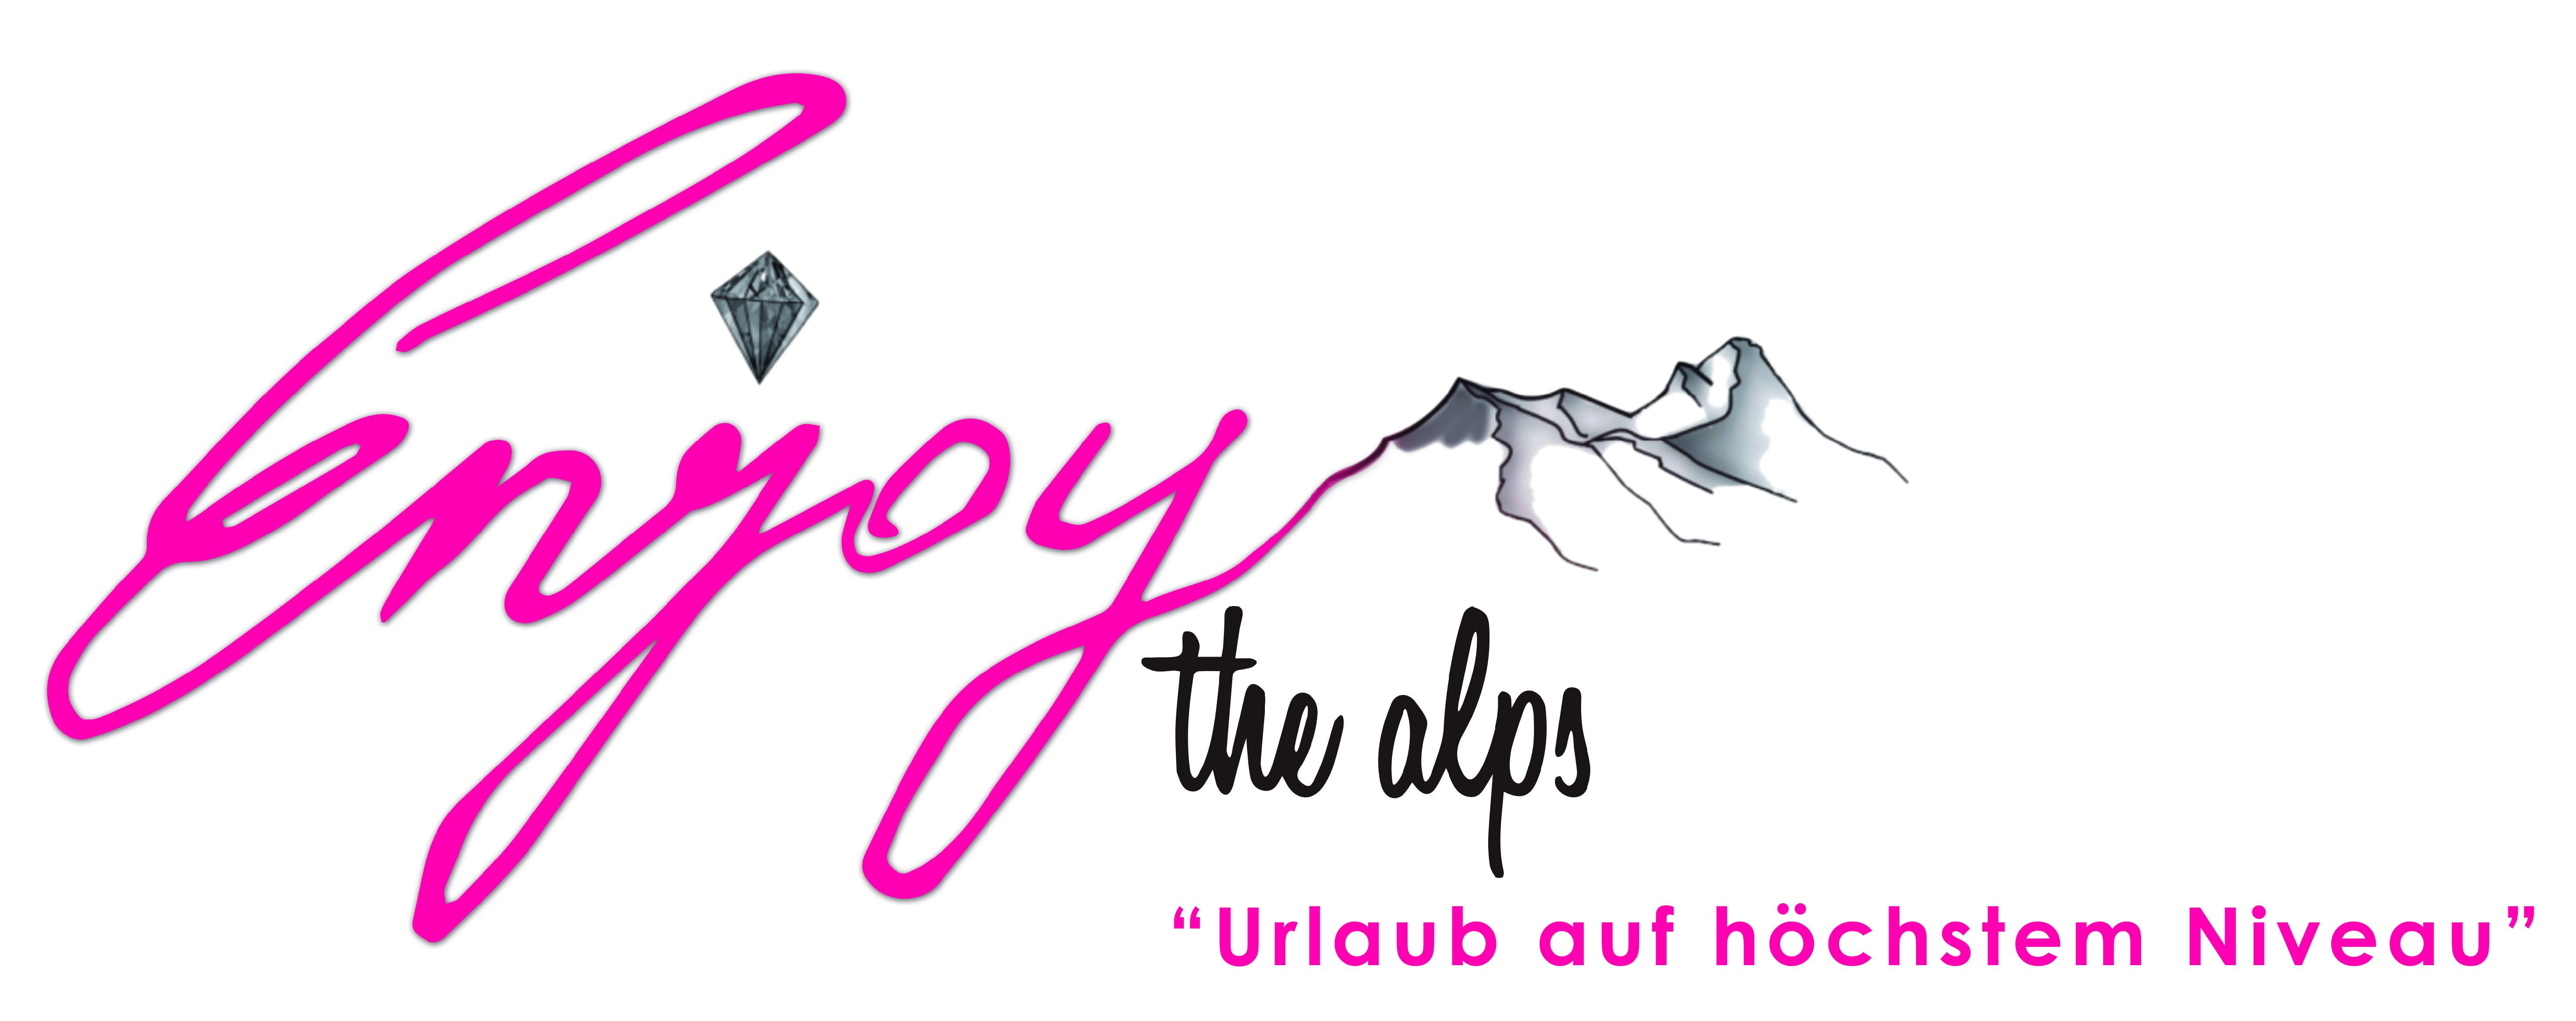 Enjoy the alps